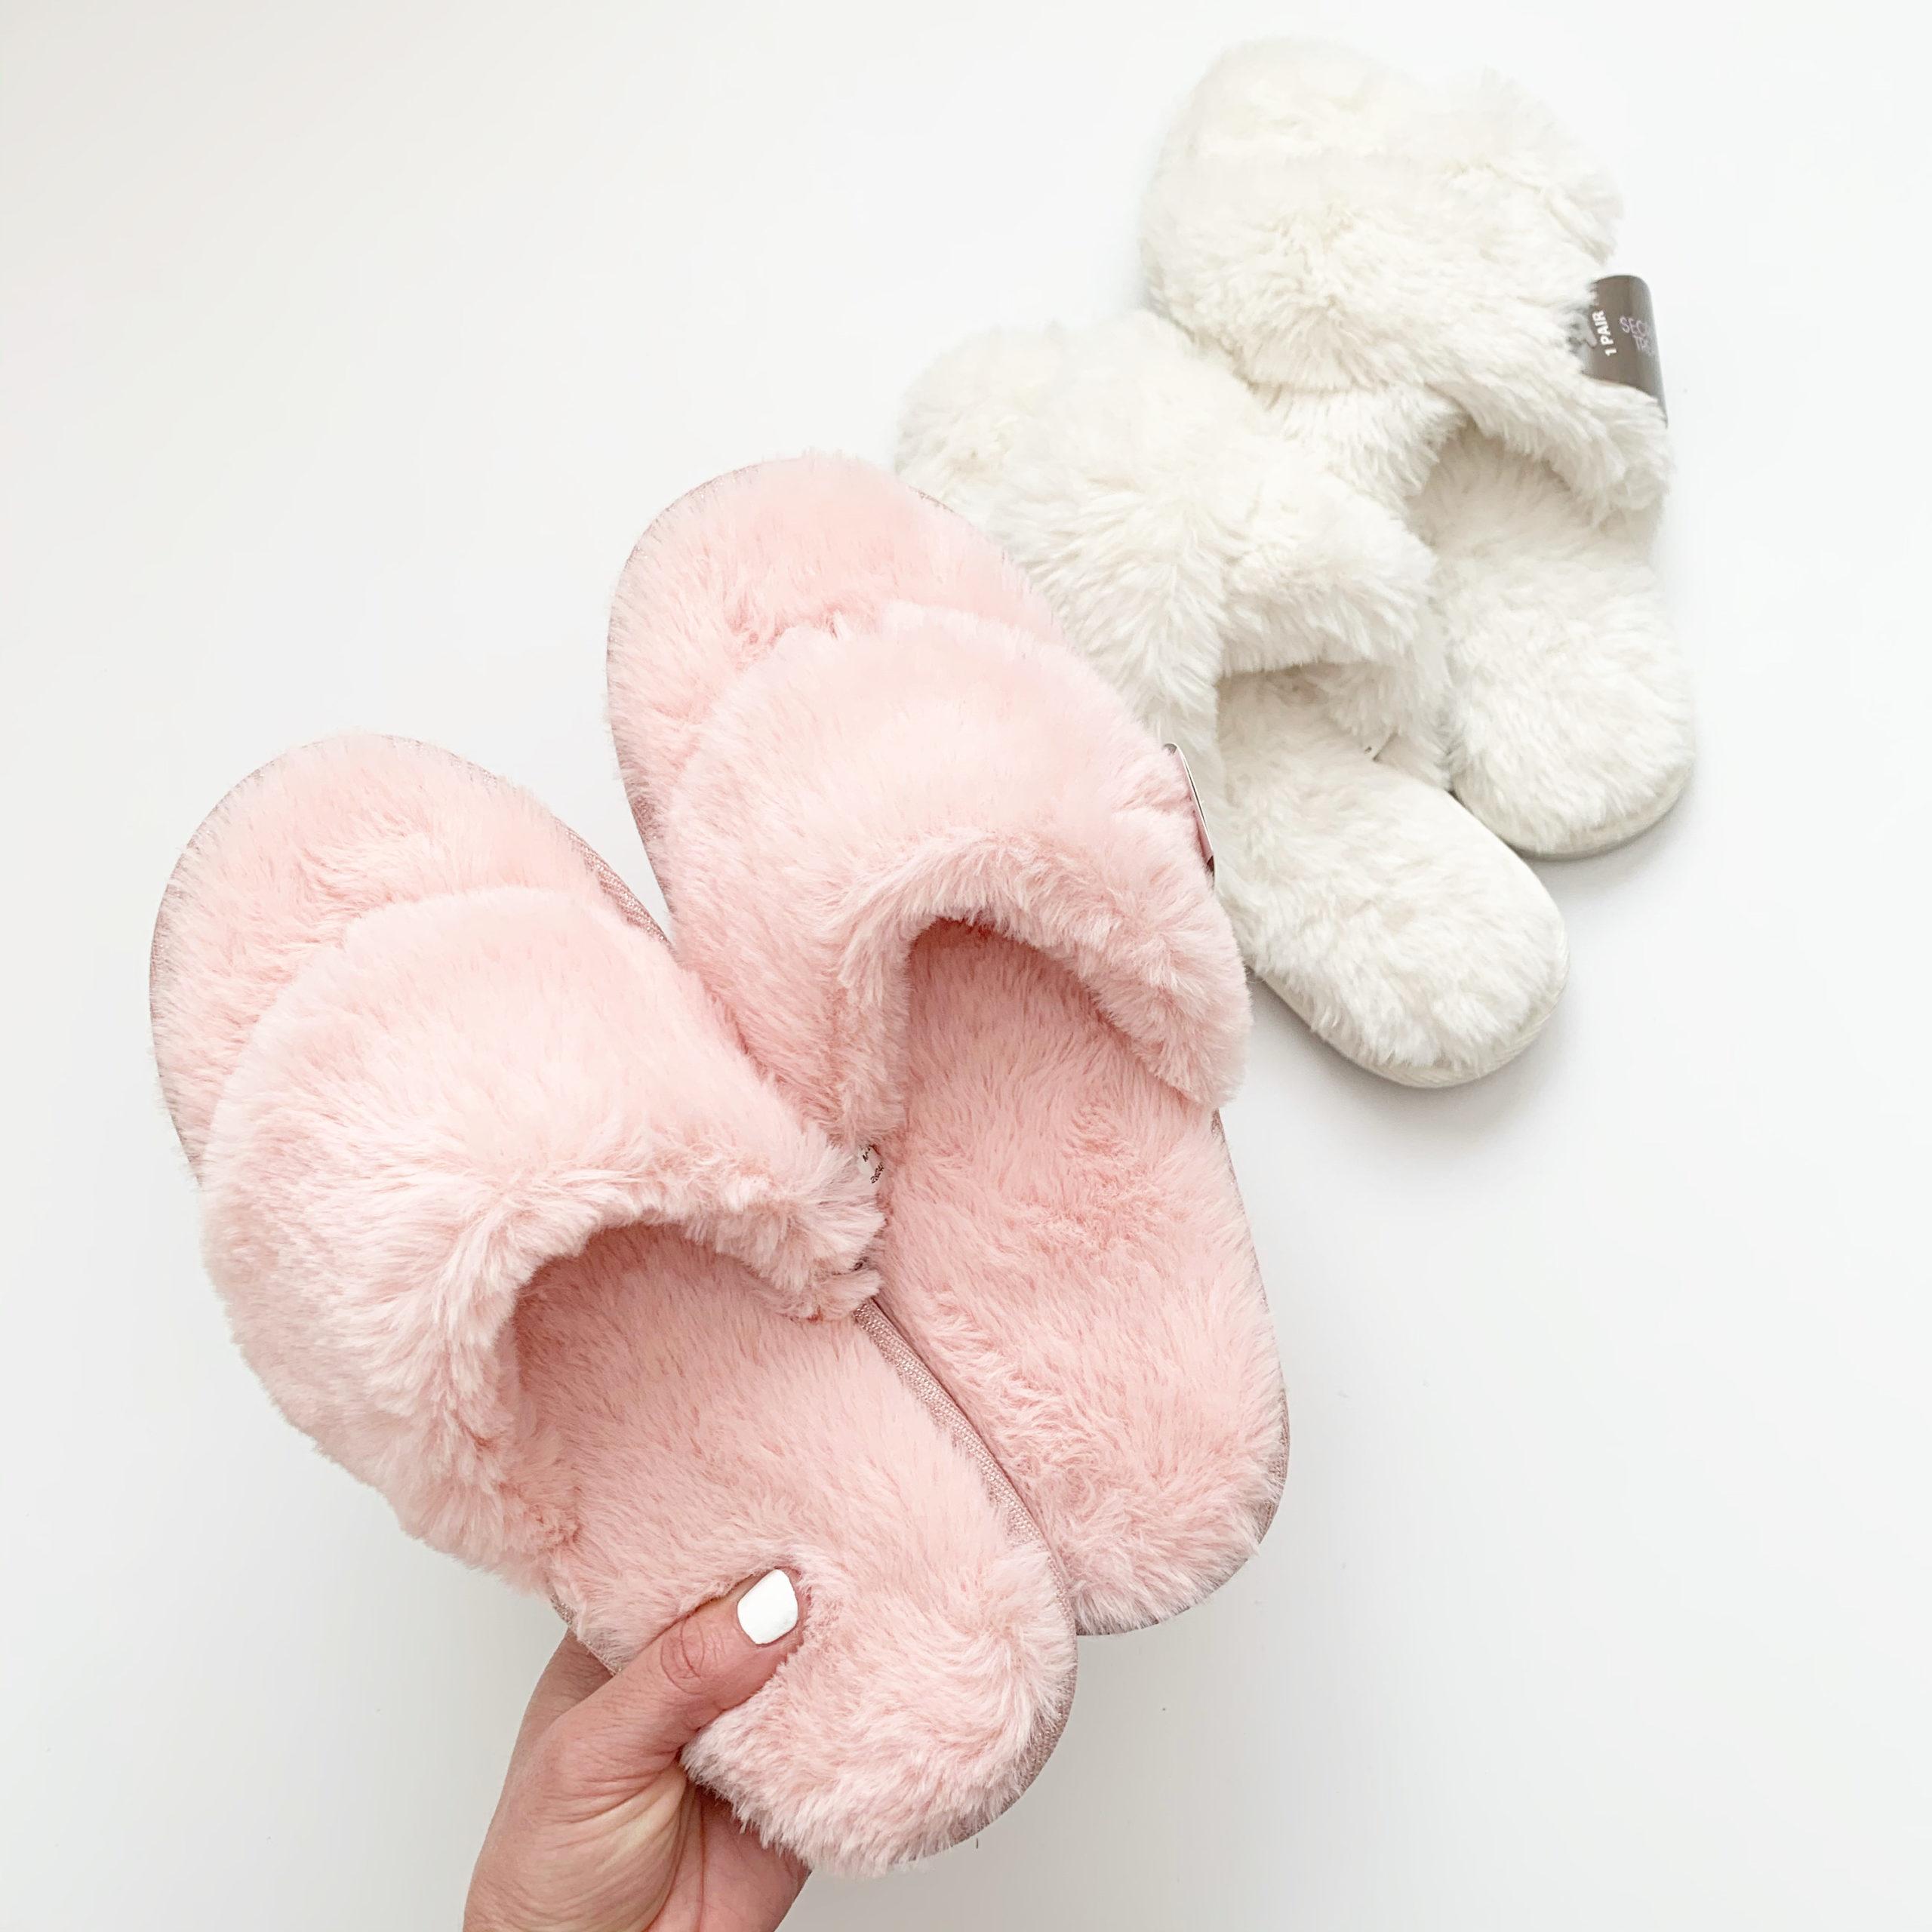 Fuzzy Crossband Slippers at Walmart